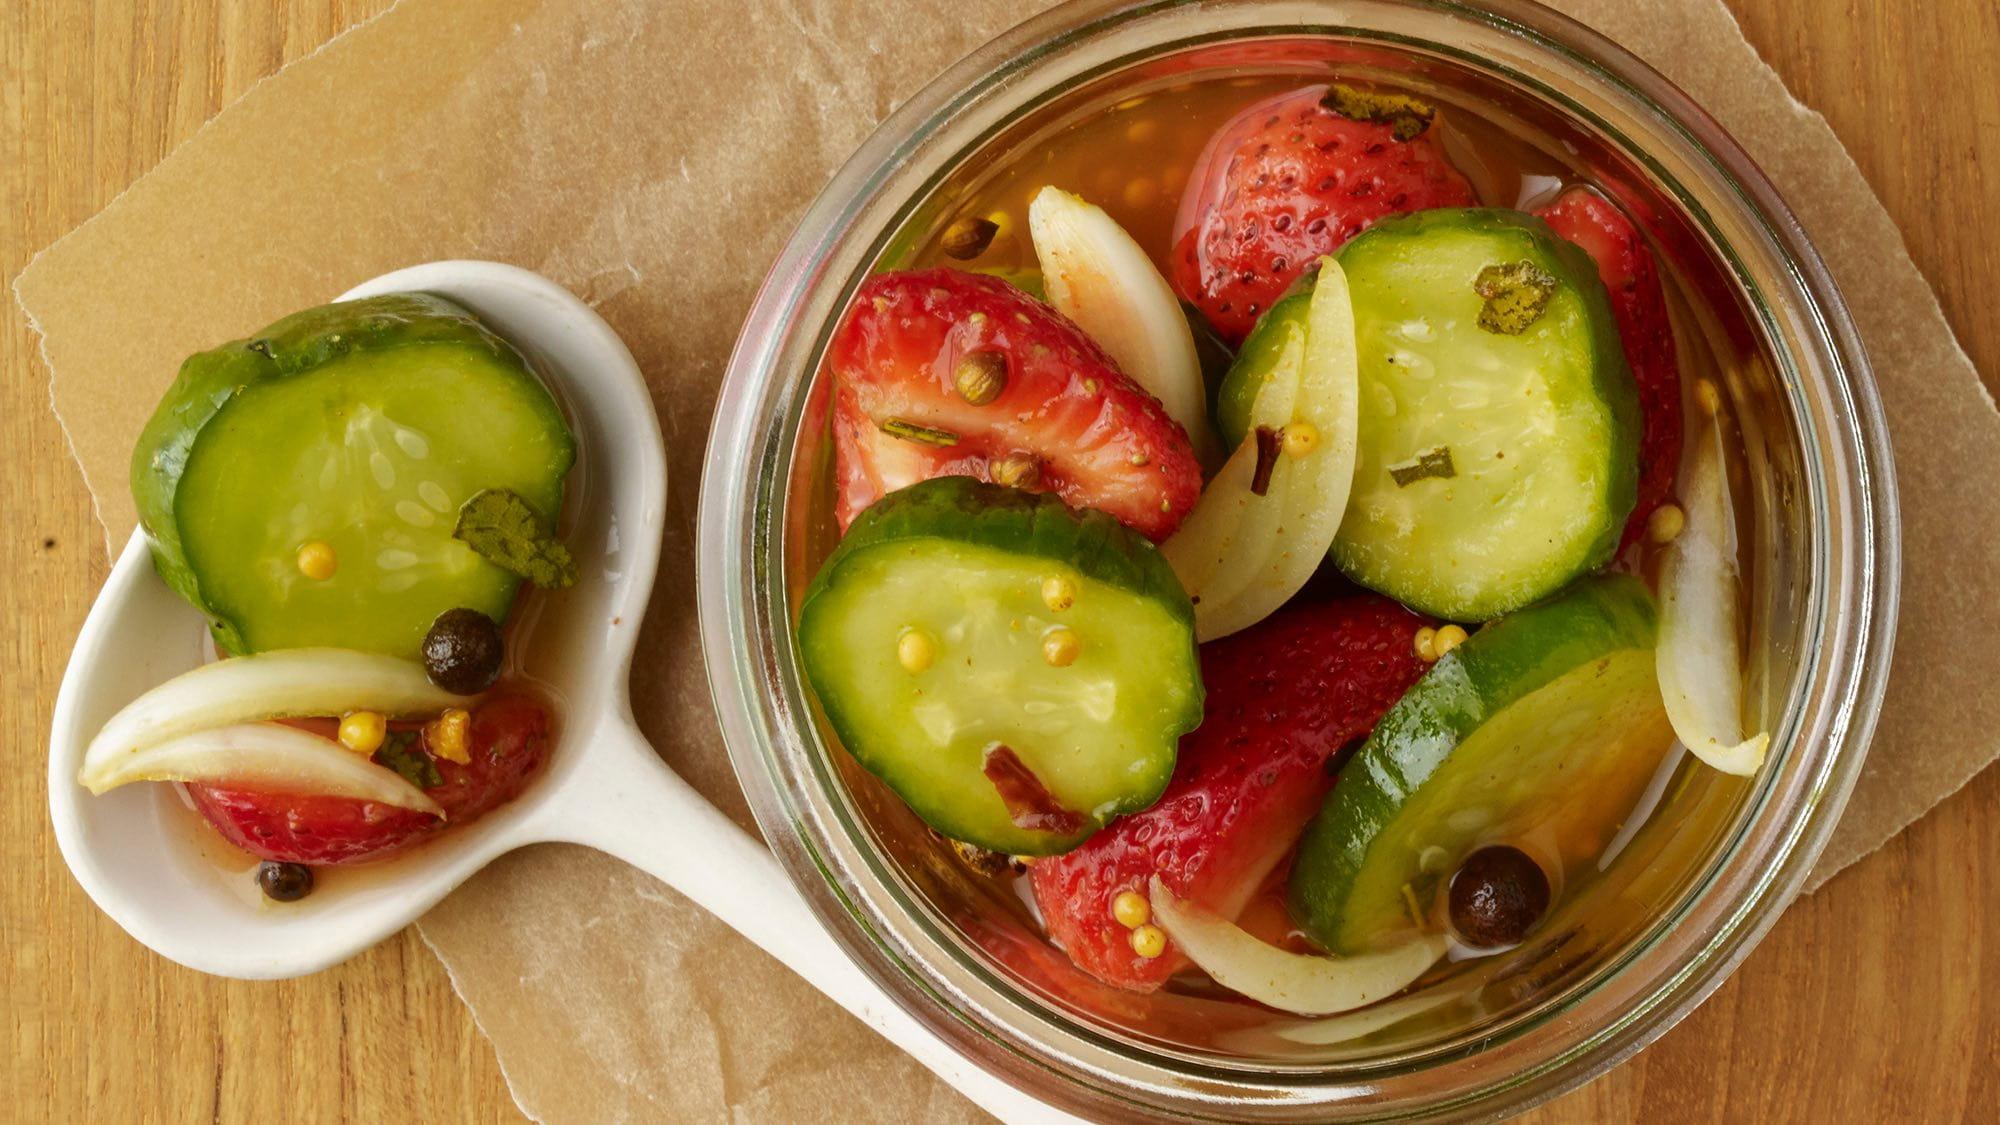 smoky-sweet-pickles-with-strawberries.jpg